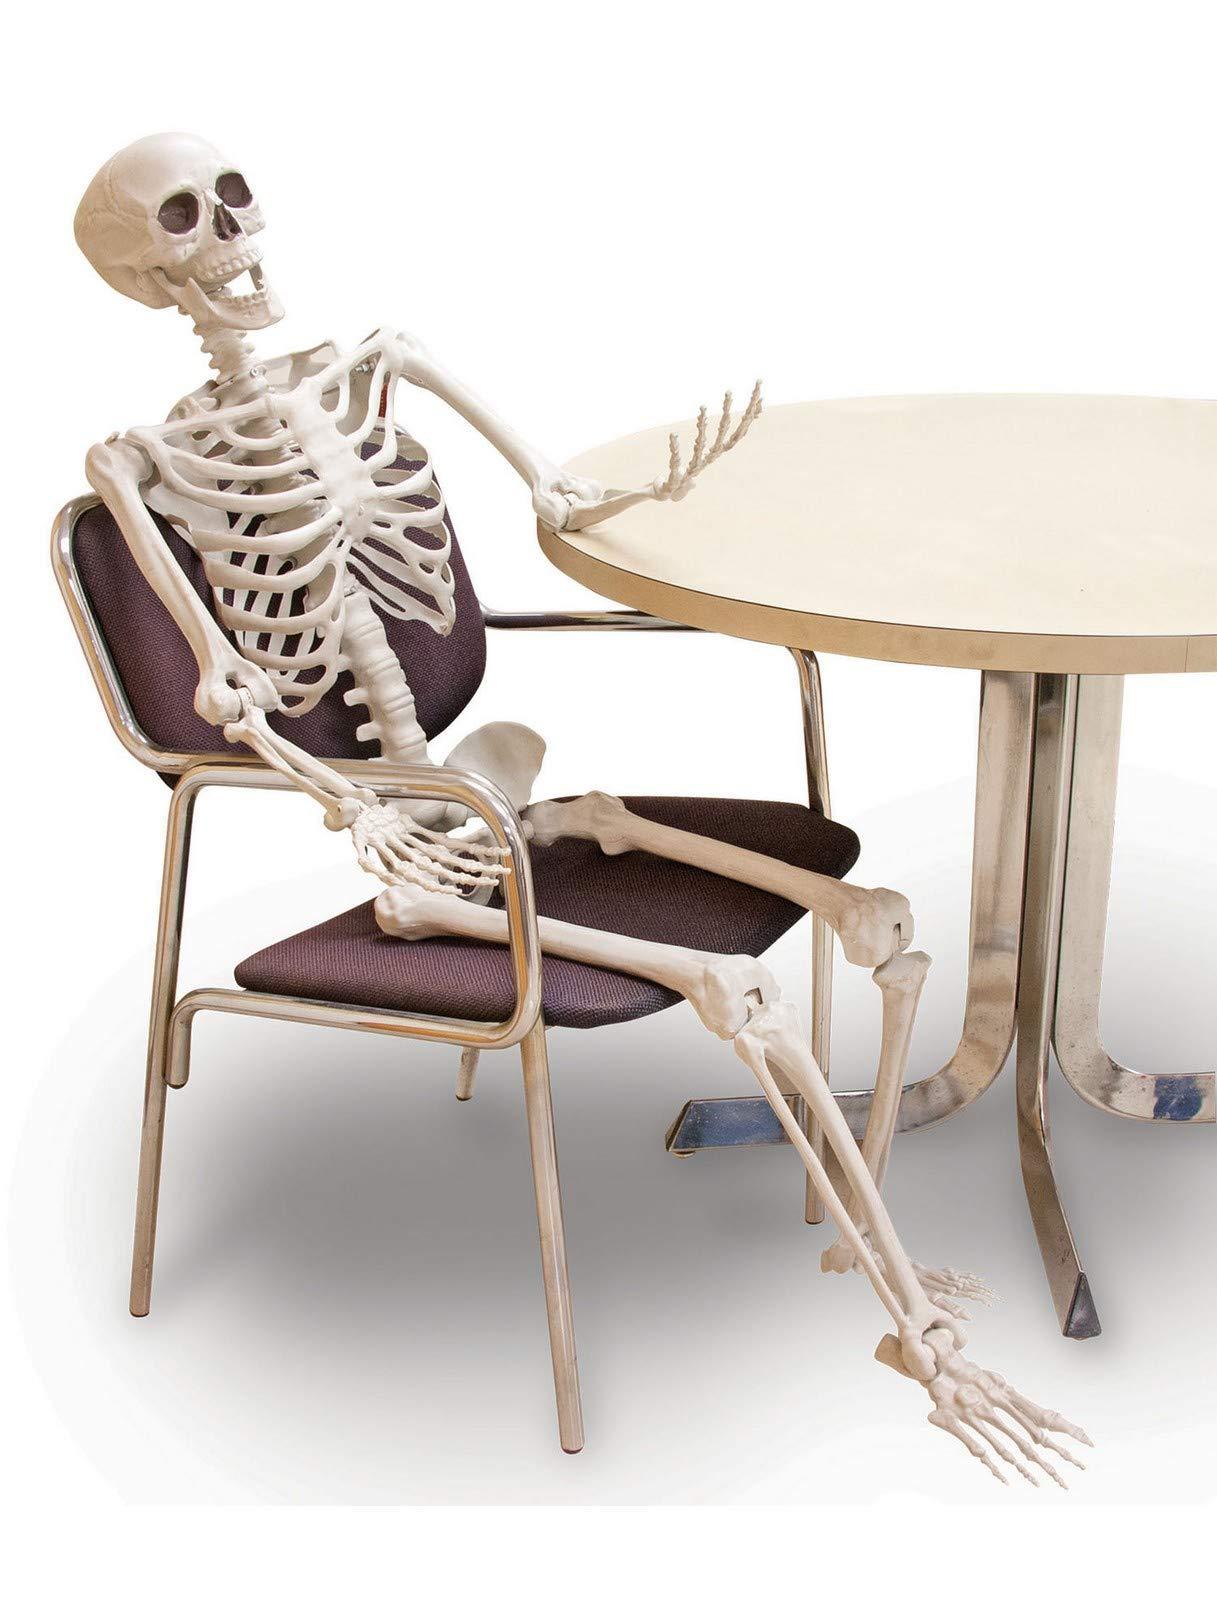 Crazy Bonez Pose-N-Stay Skeleton by Crazy Bonez